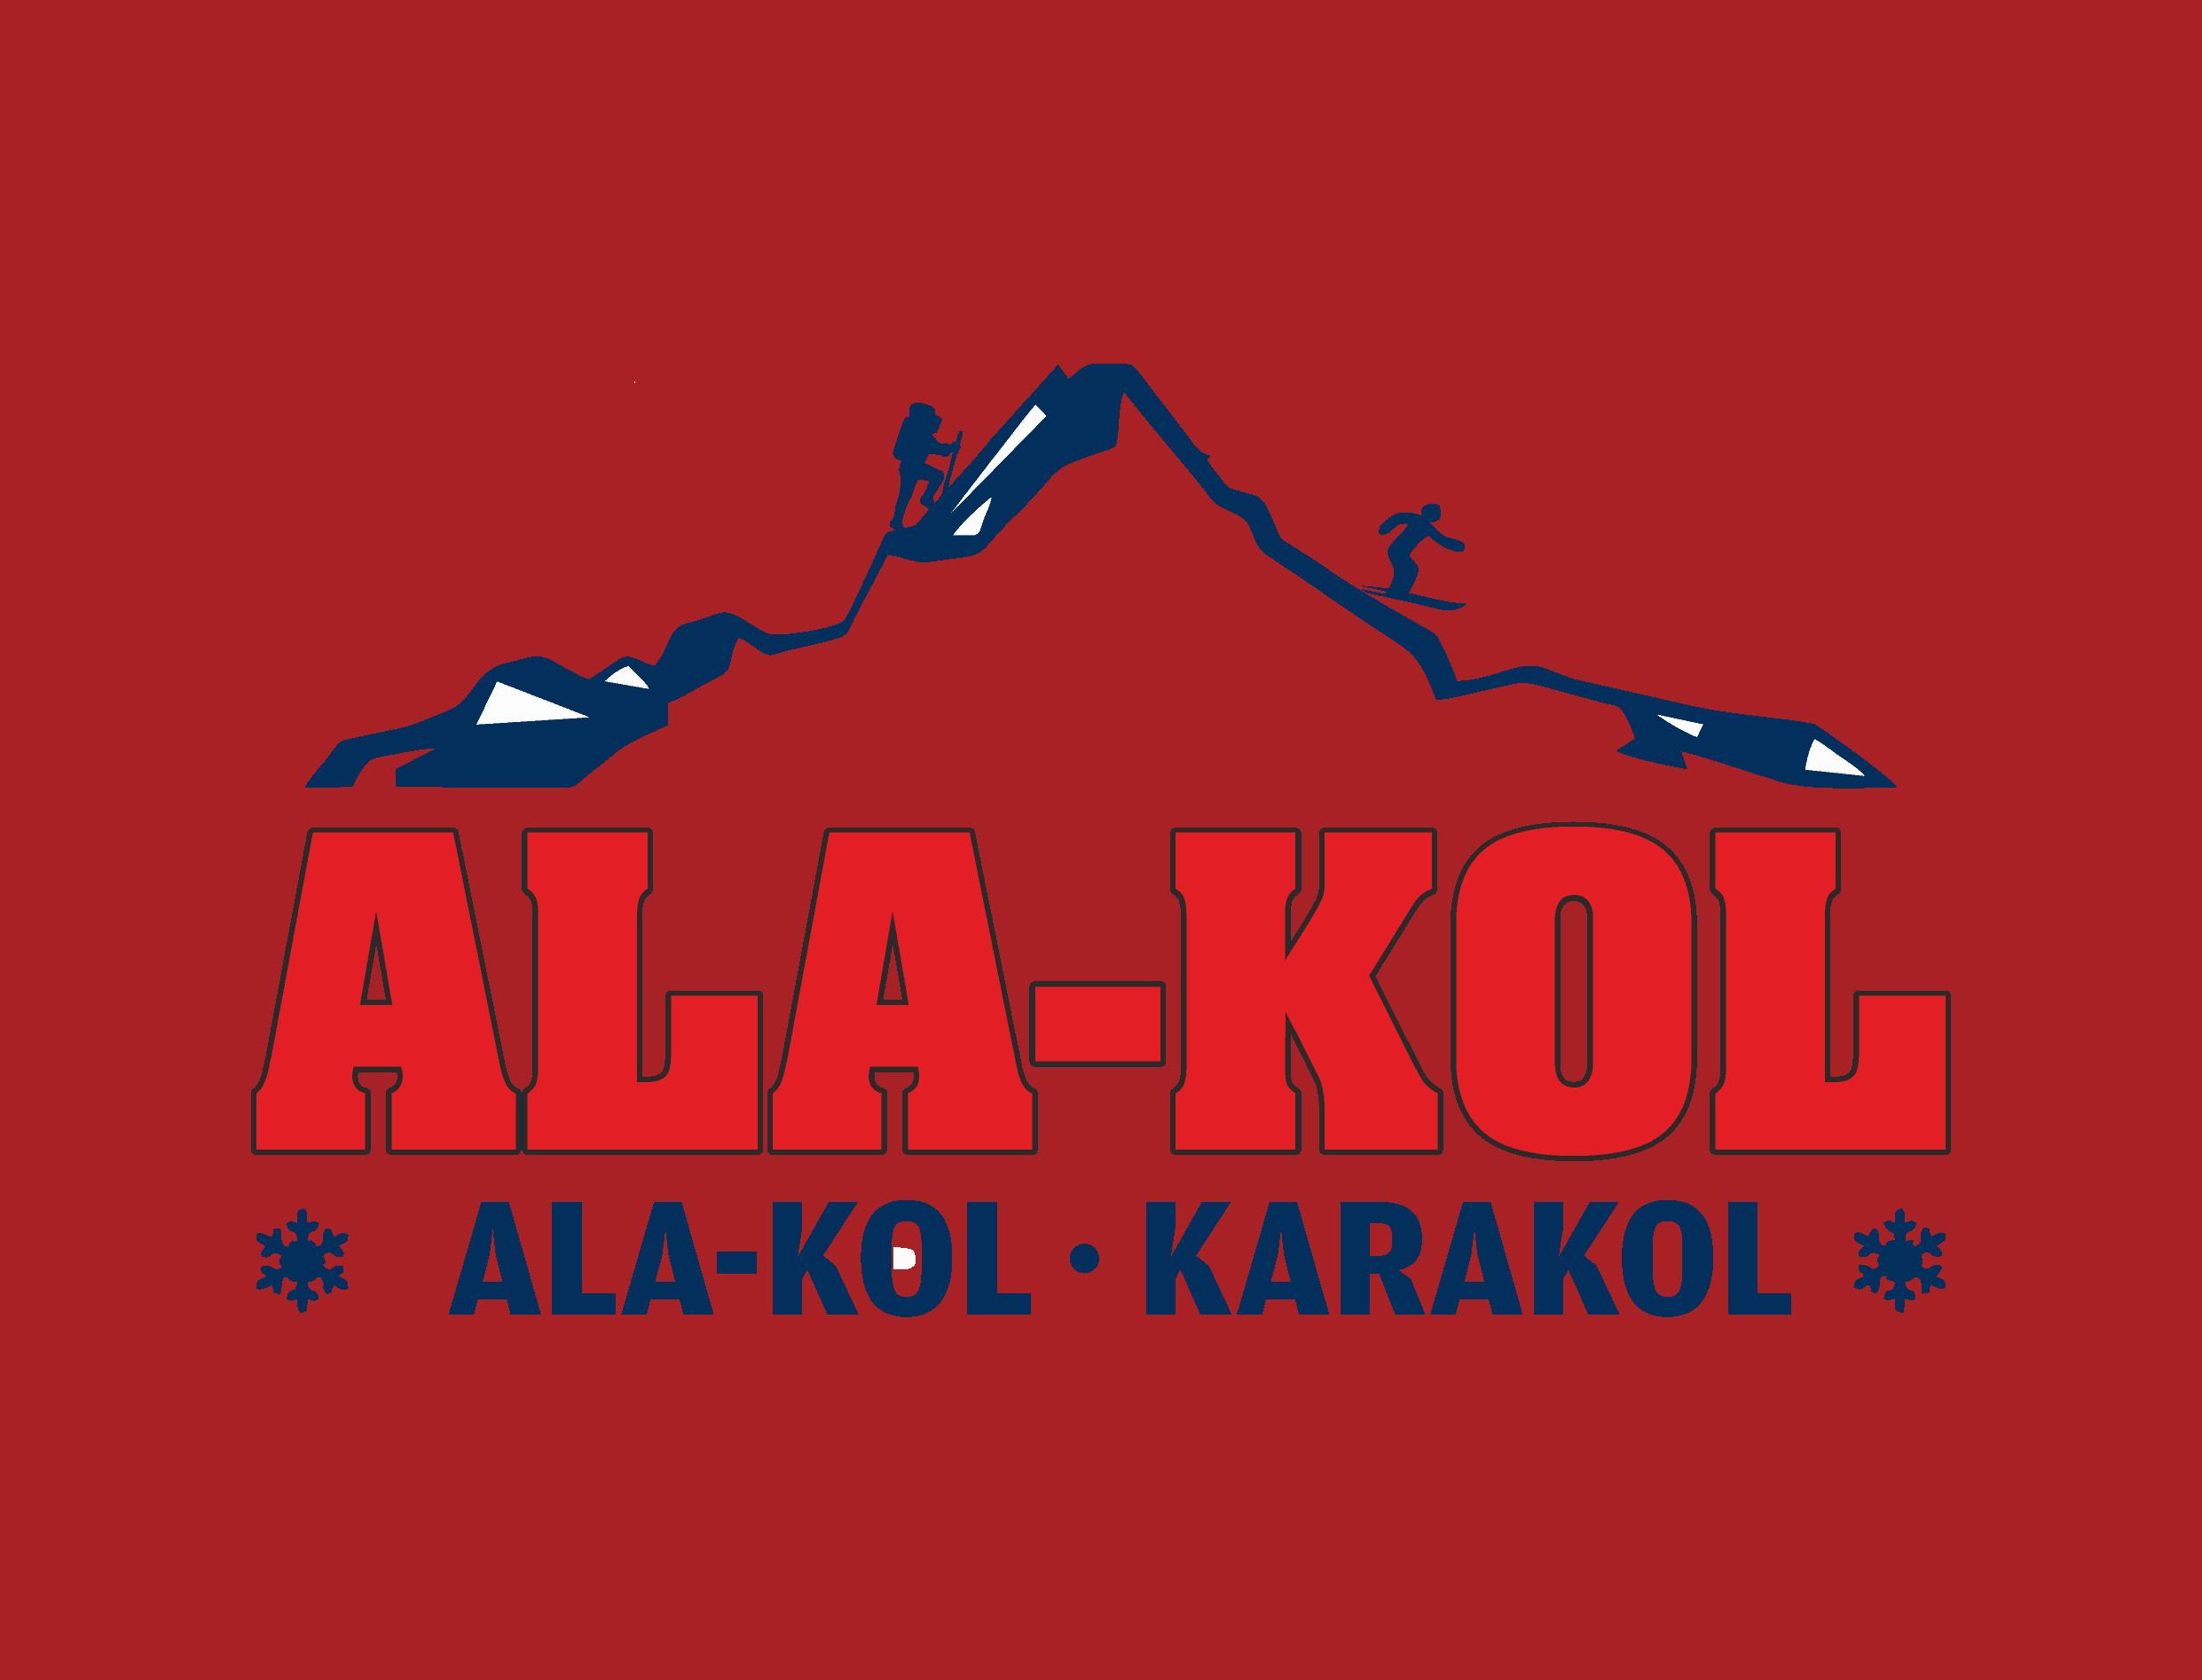 Ala-Kol Guesthouse